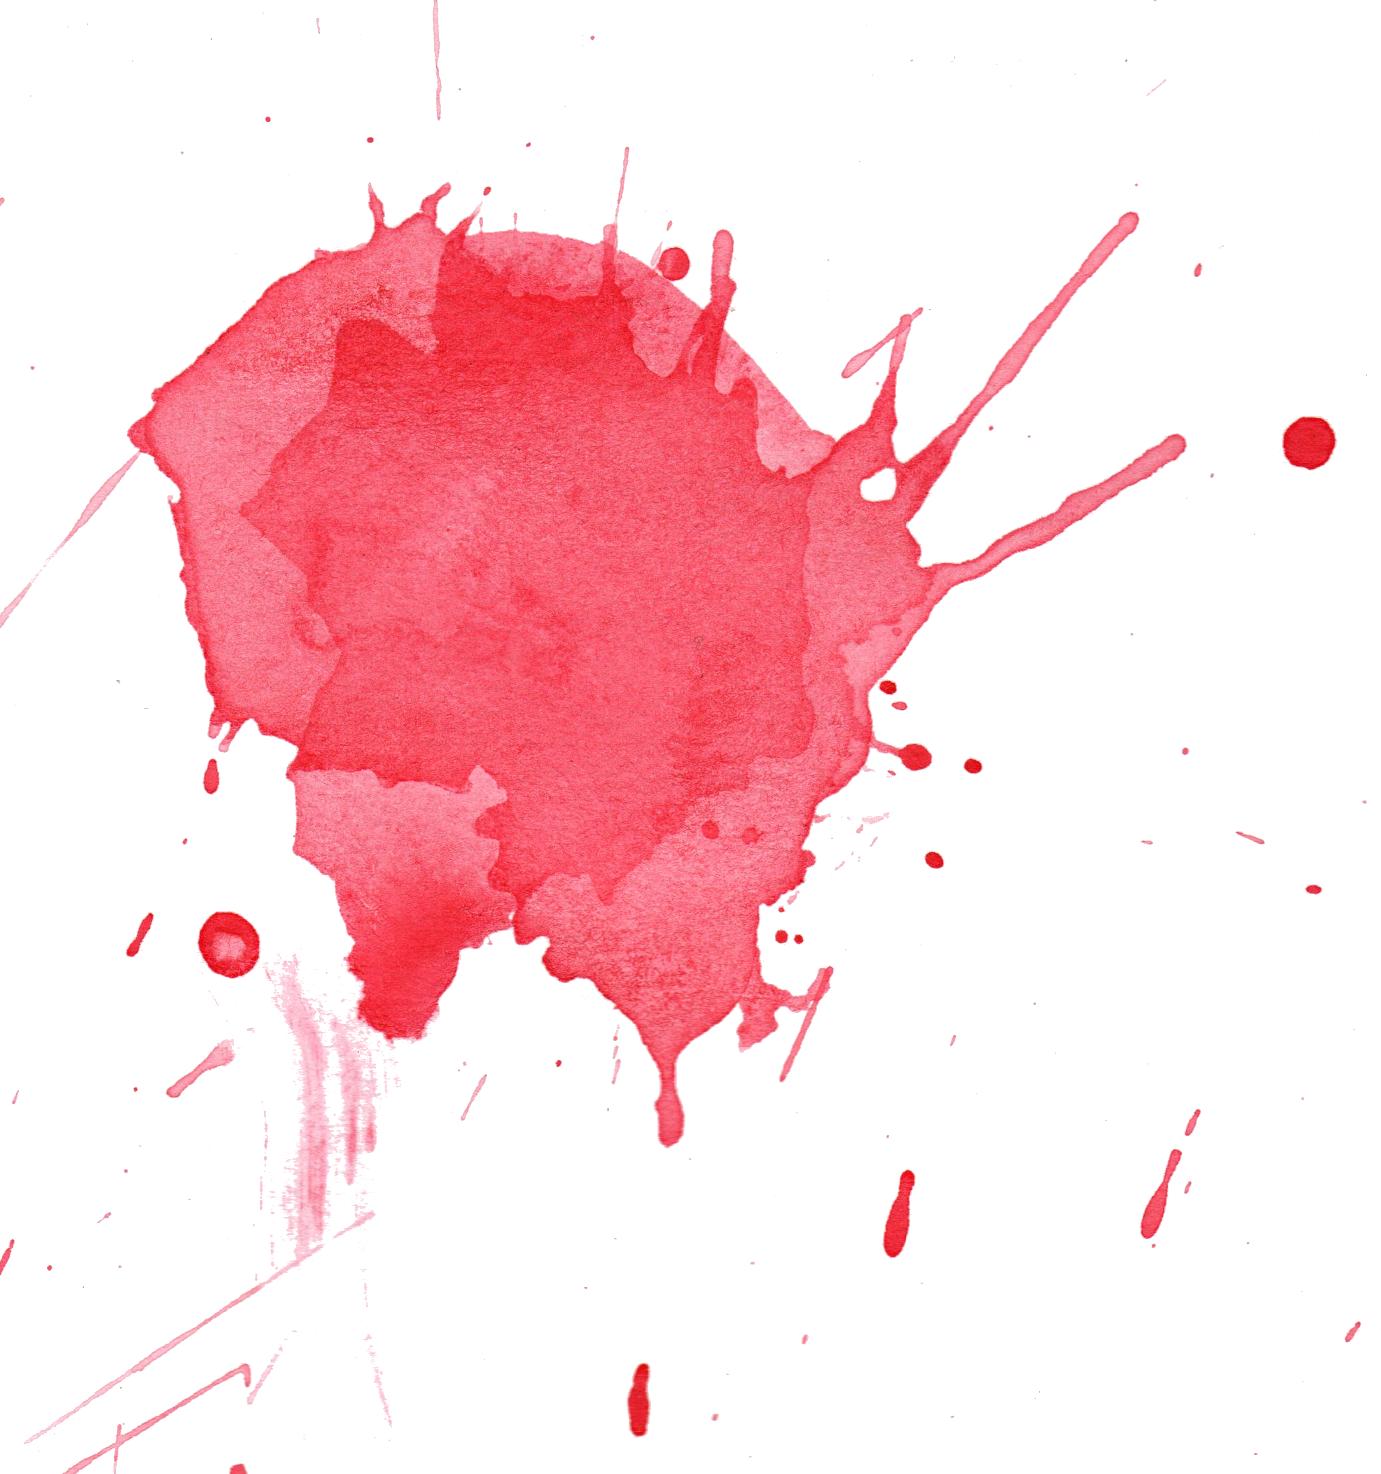 6 Red Watercolor Splatter (PNG Transparent) | OnlyGFX.com